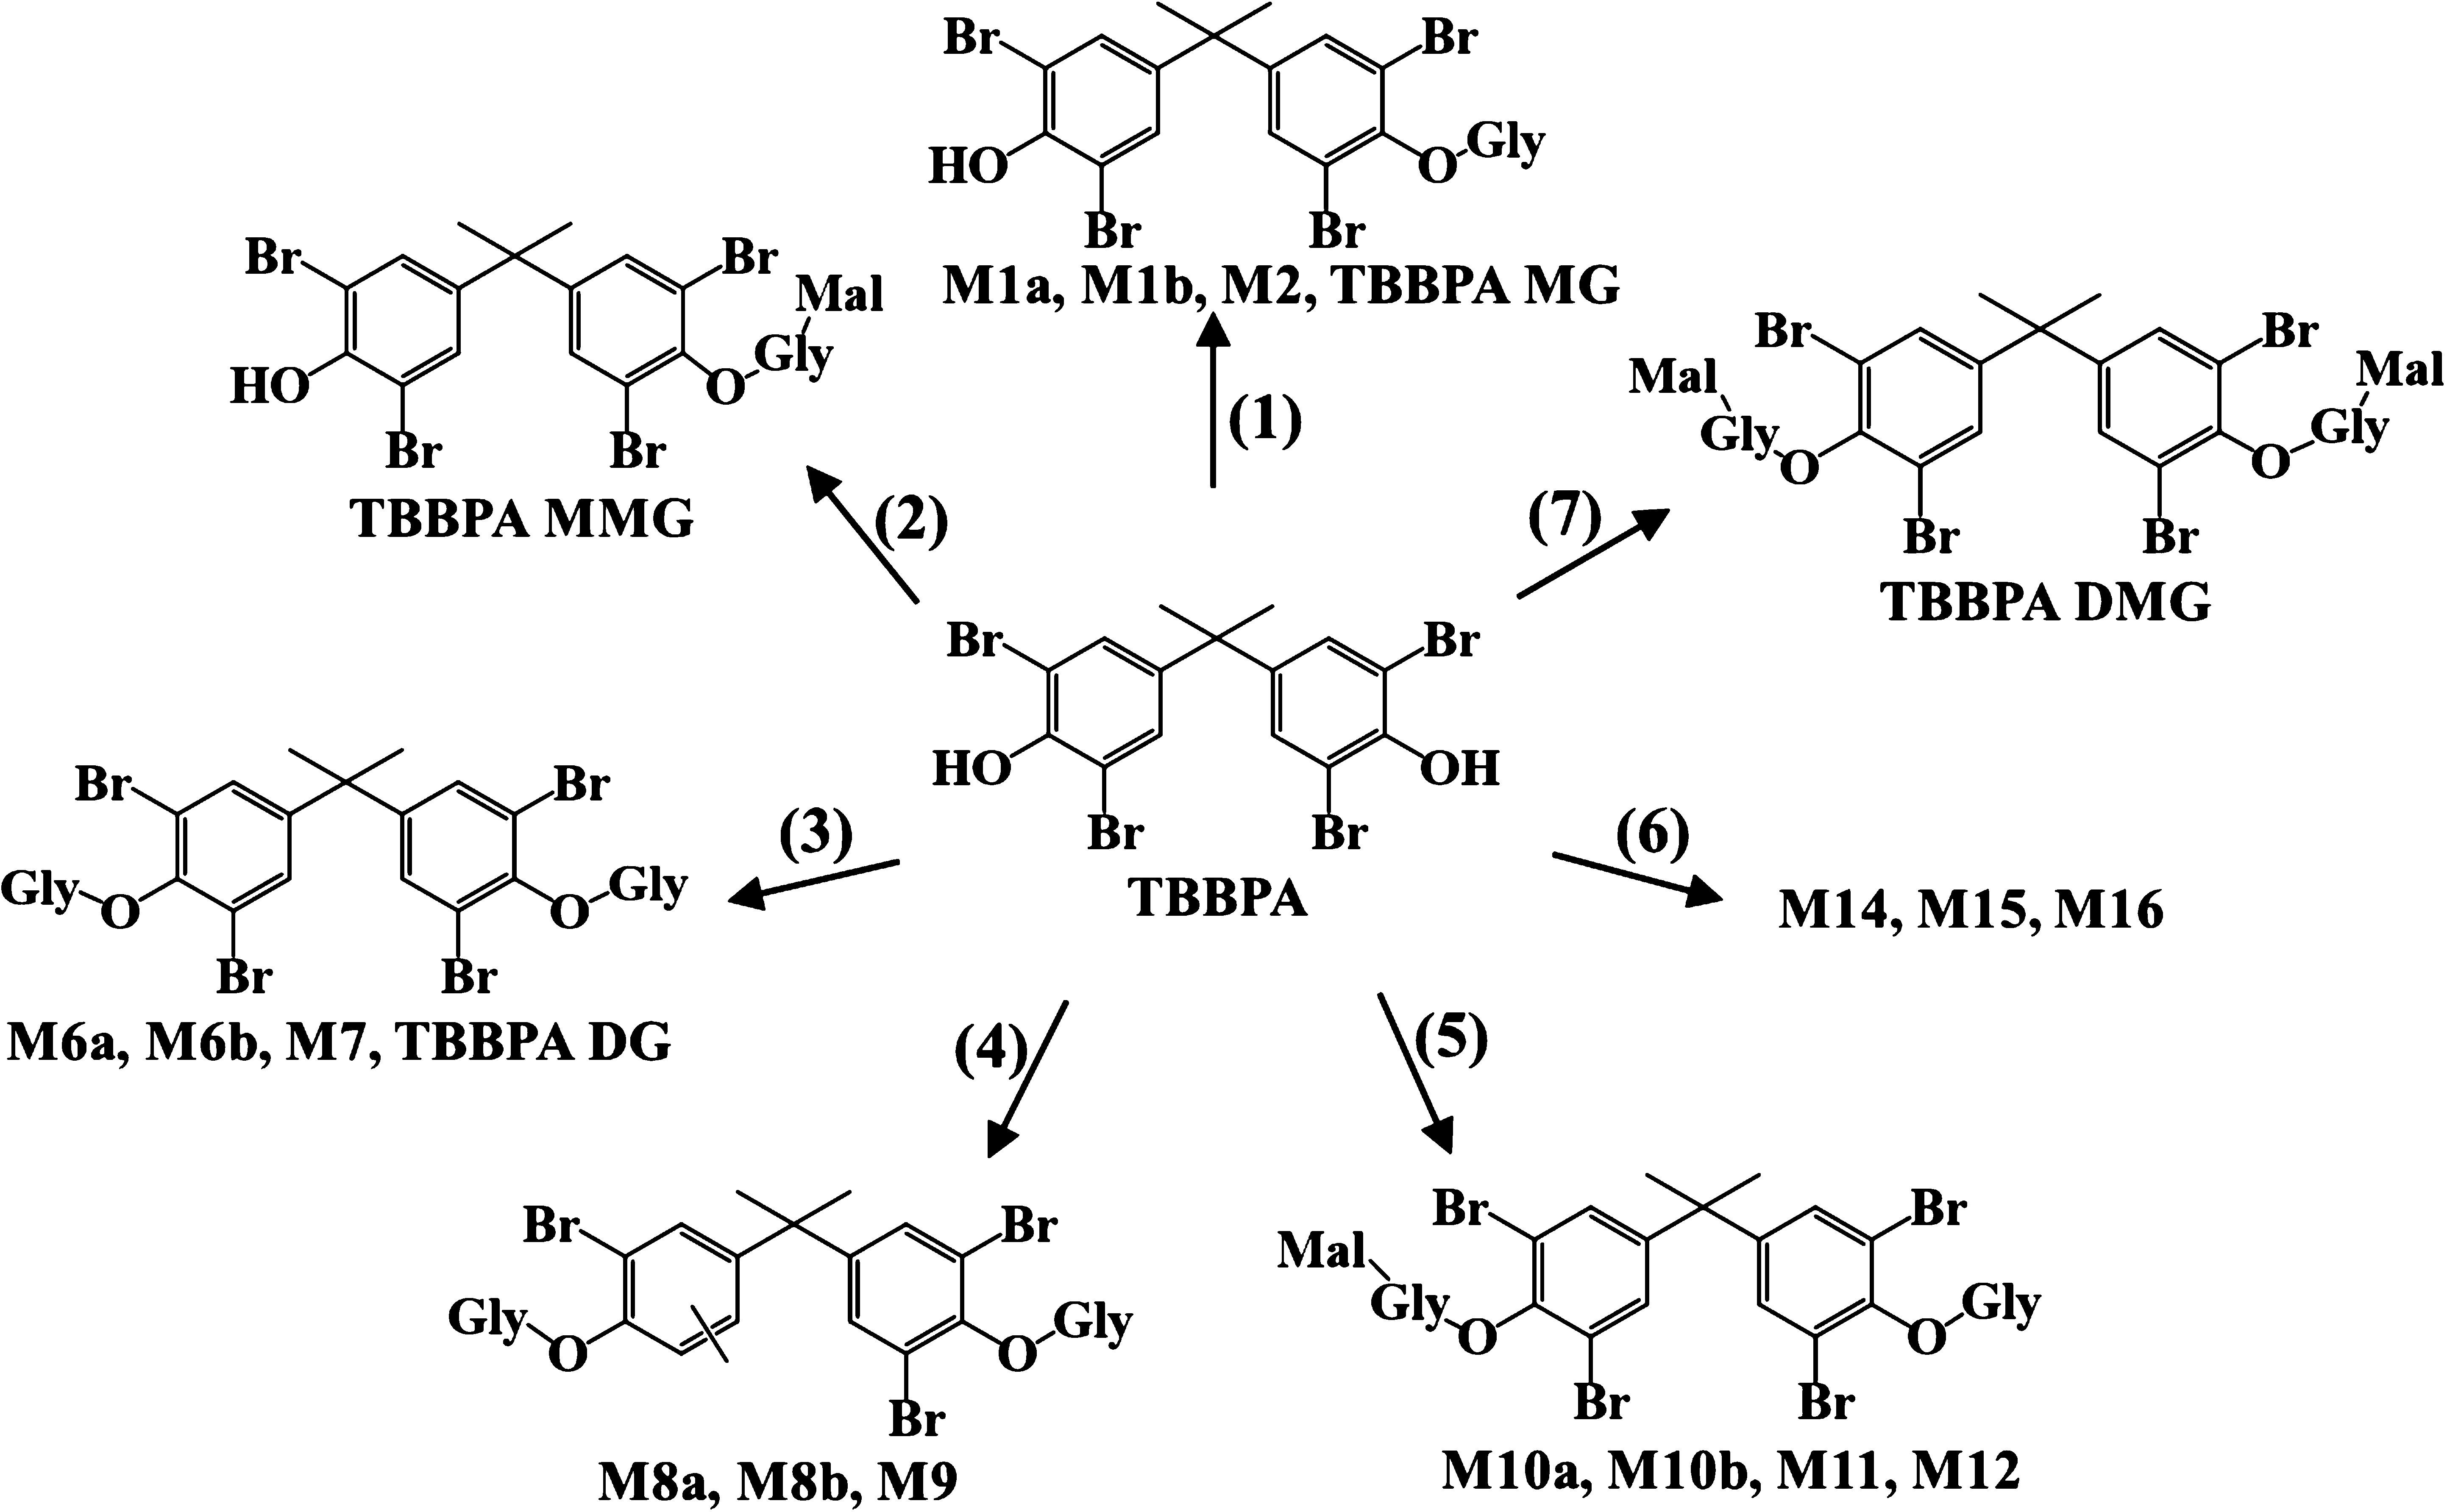 TBBPA metabolites